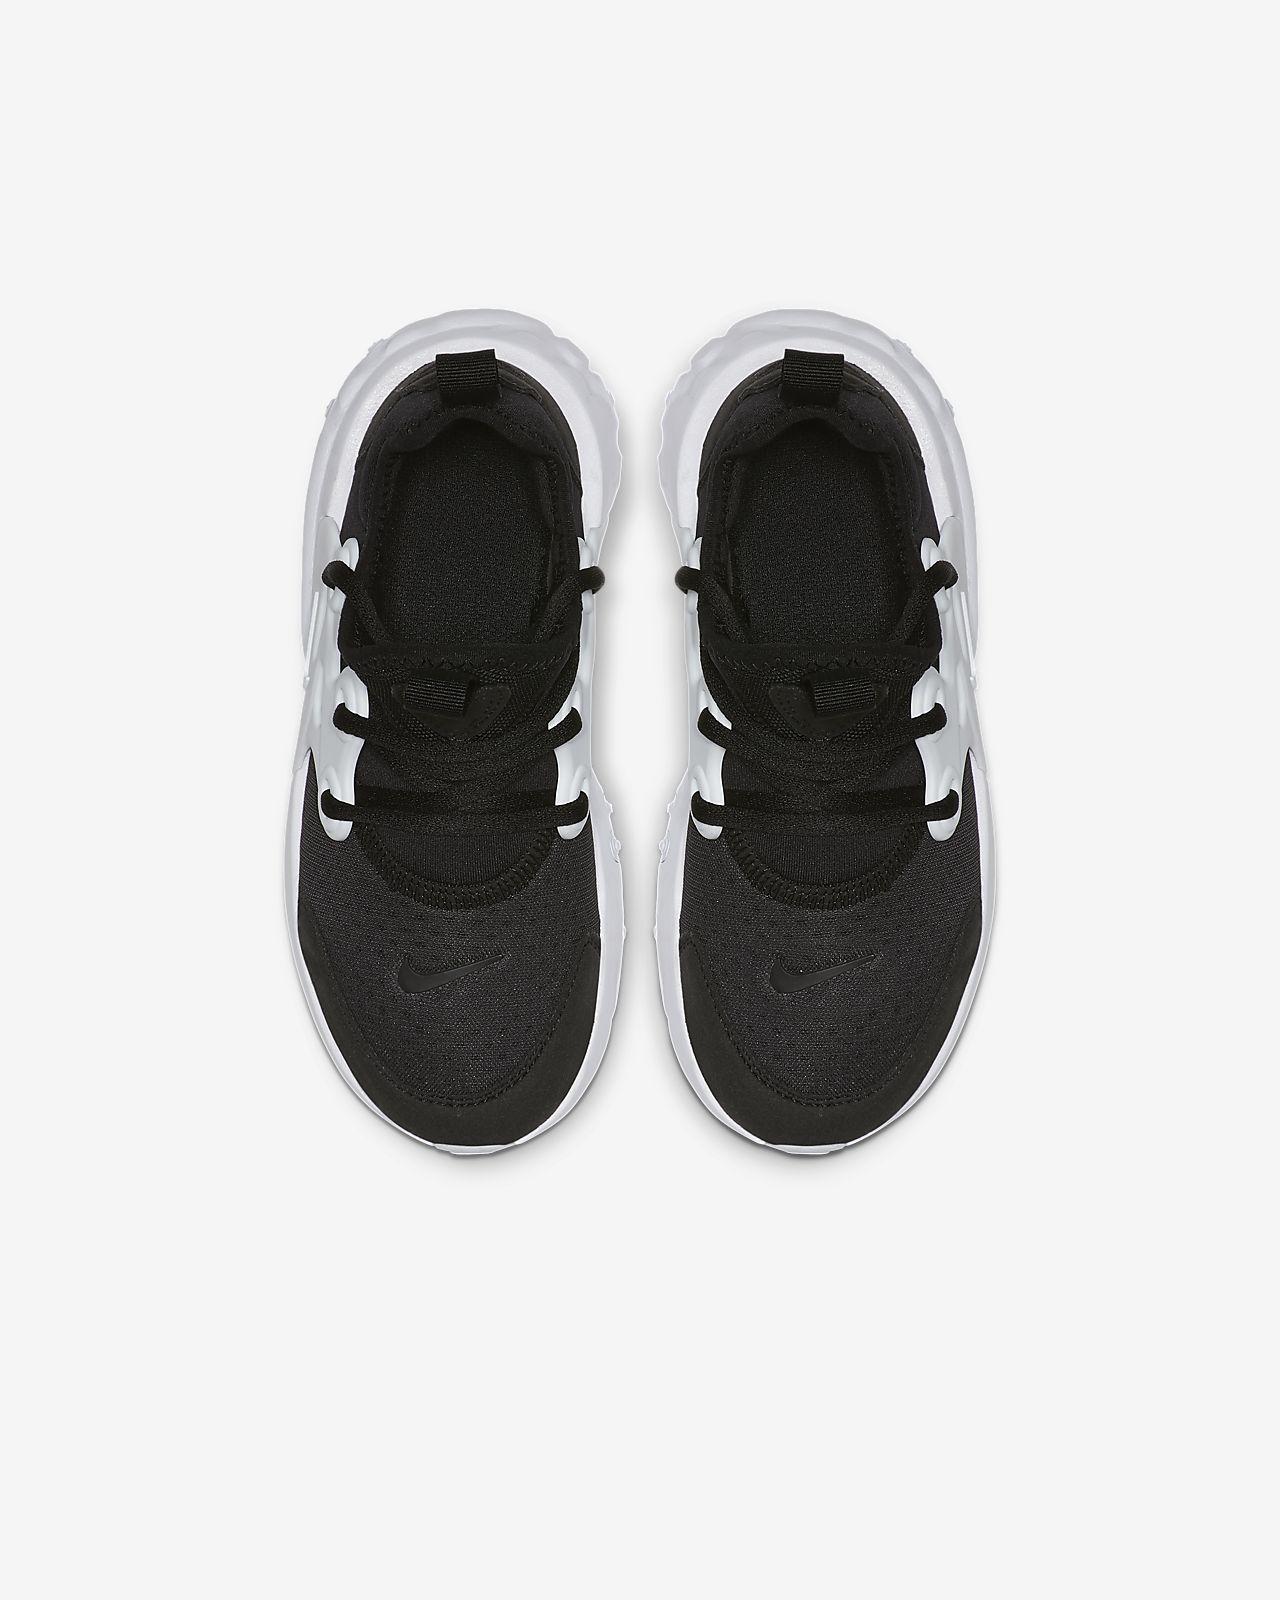 Nike Schuh React Jüngere OkuZPiXT KinderLu Presto Für sCQrdth